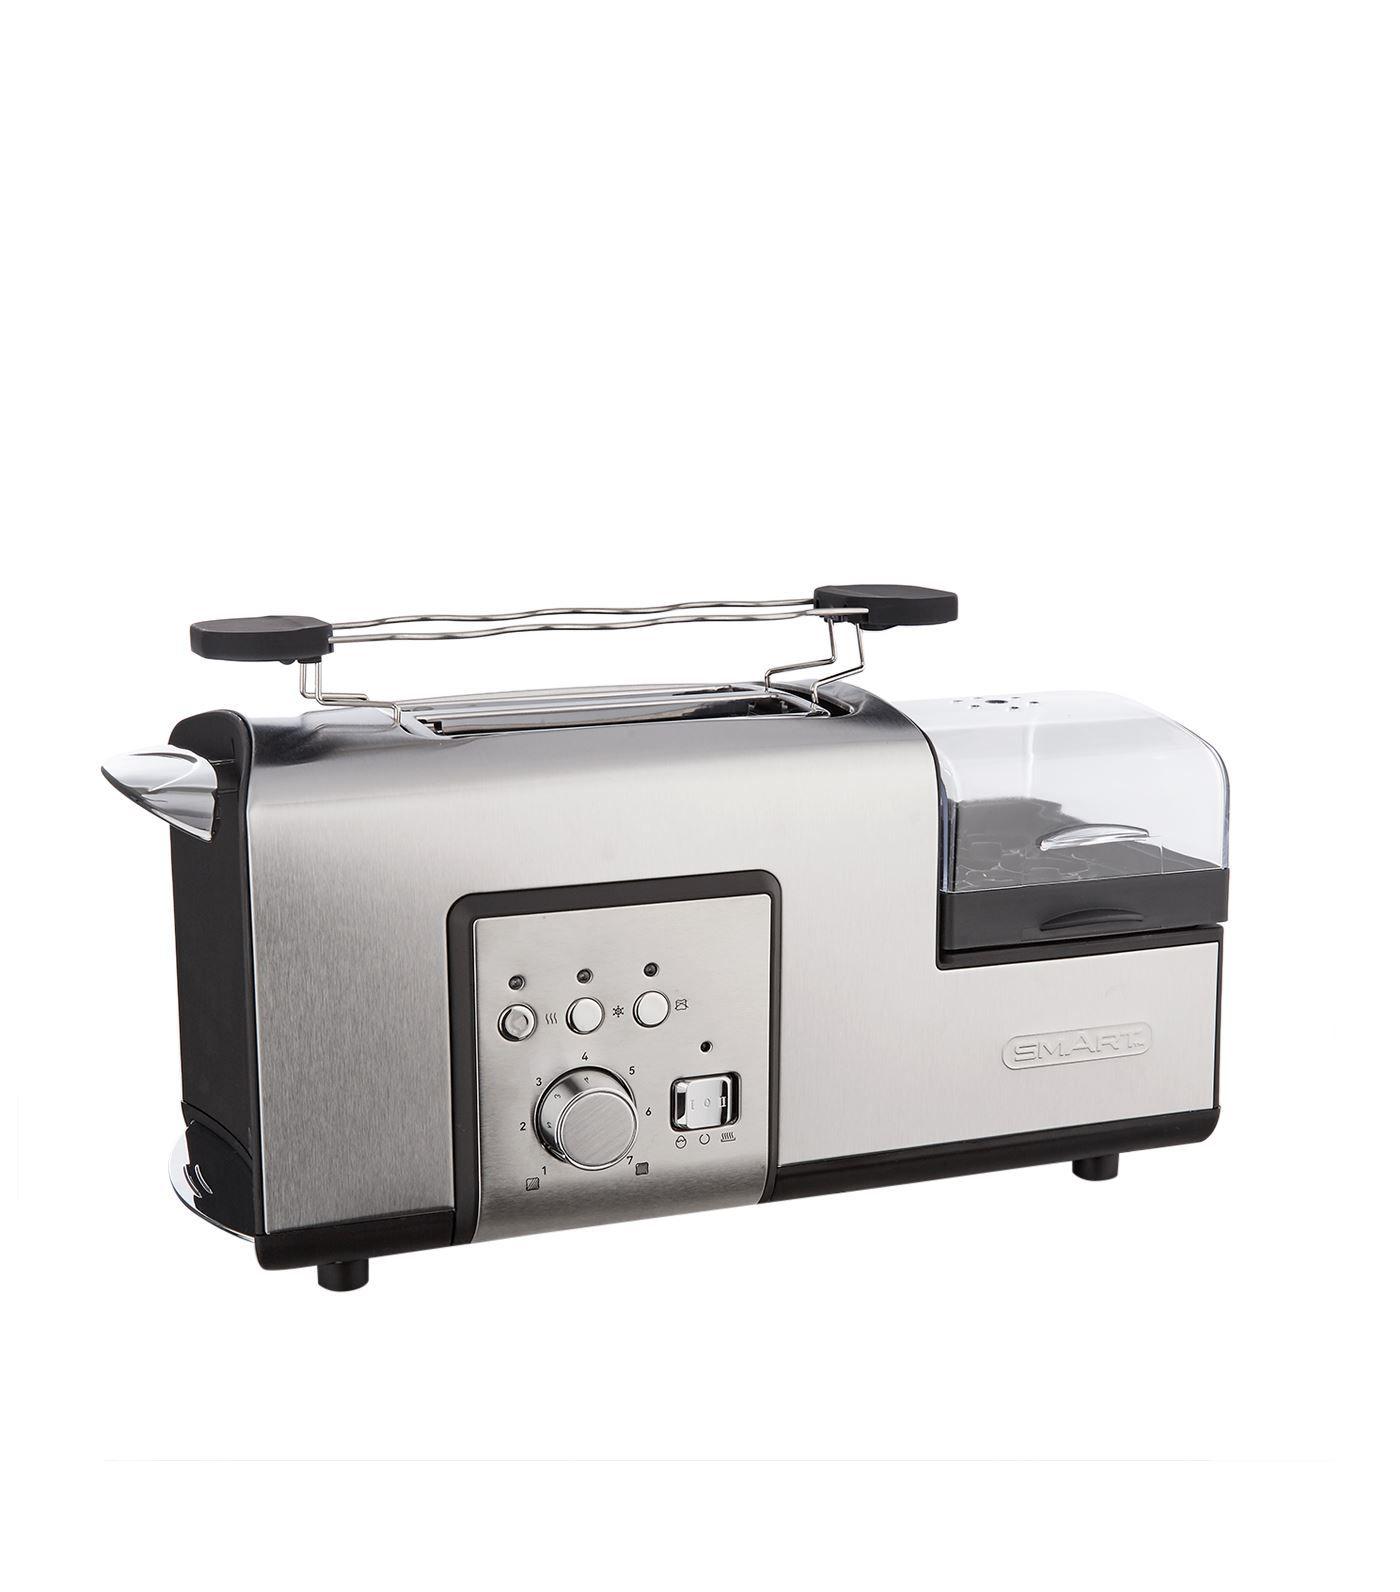 Designer Brands List Harrods Com Smart Cooking Cooking Appliances Bugatti